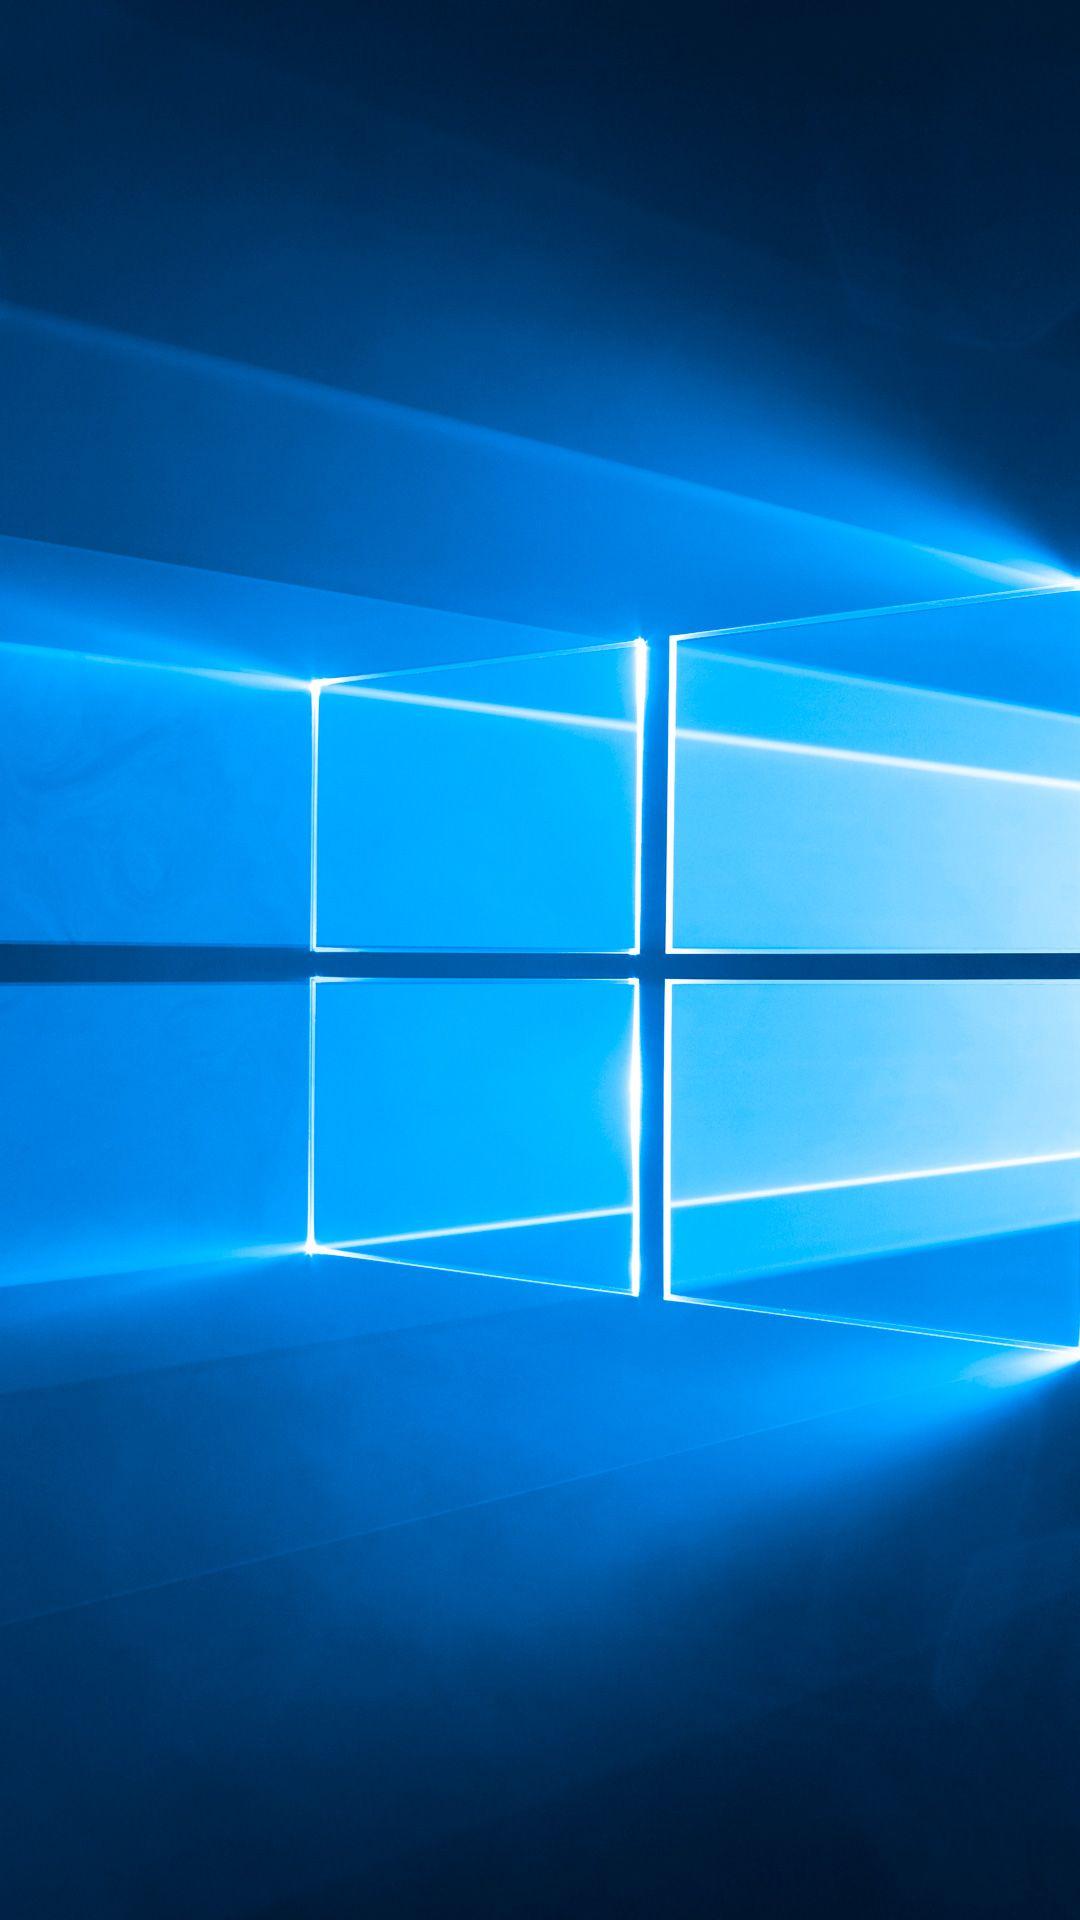 Windows10 Mobile デフォルト壁紙ダウンロード Sumacasecom